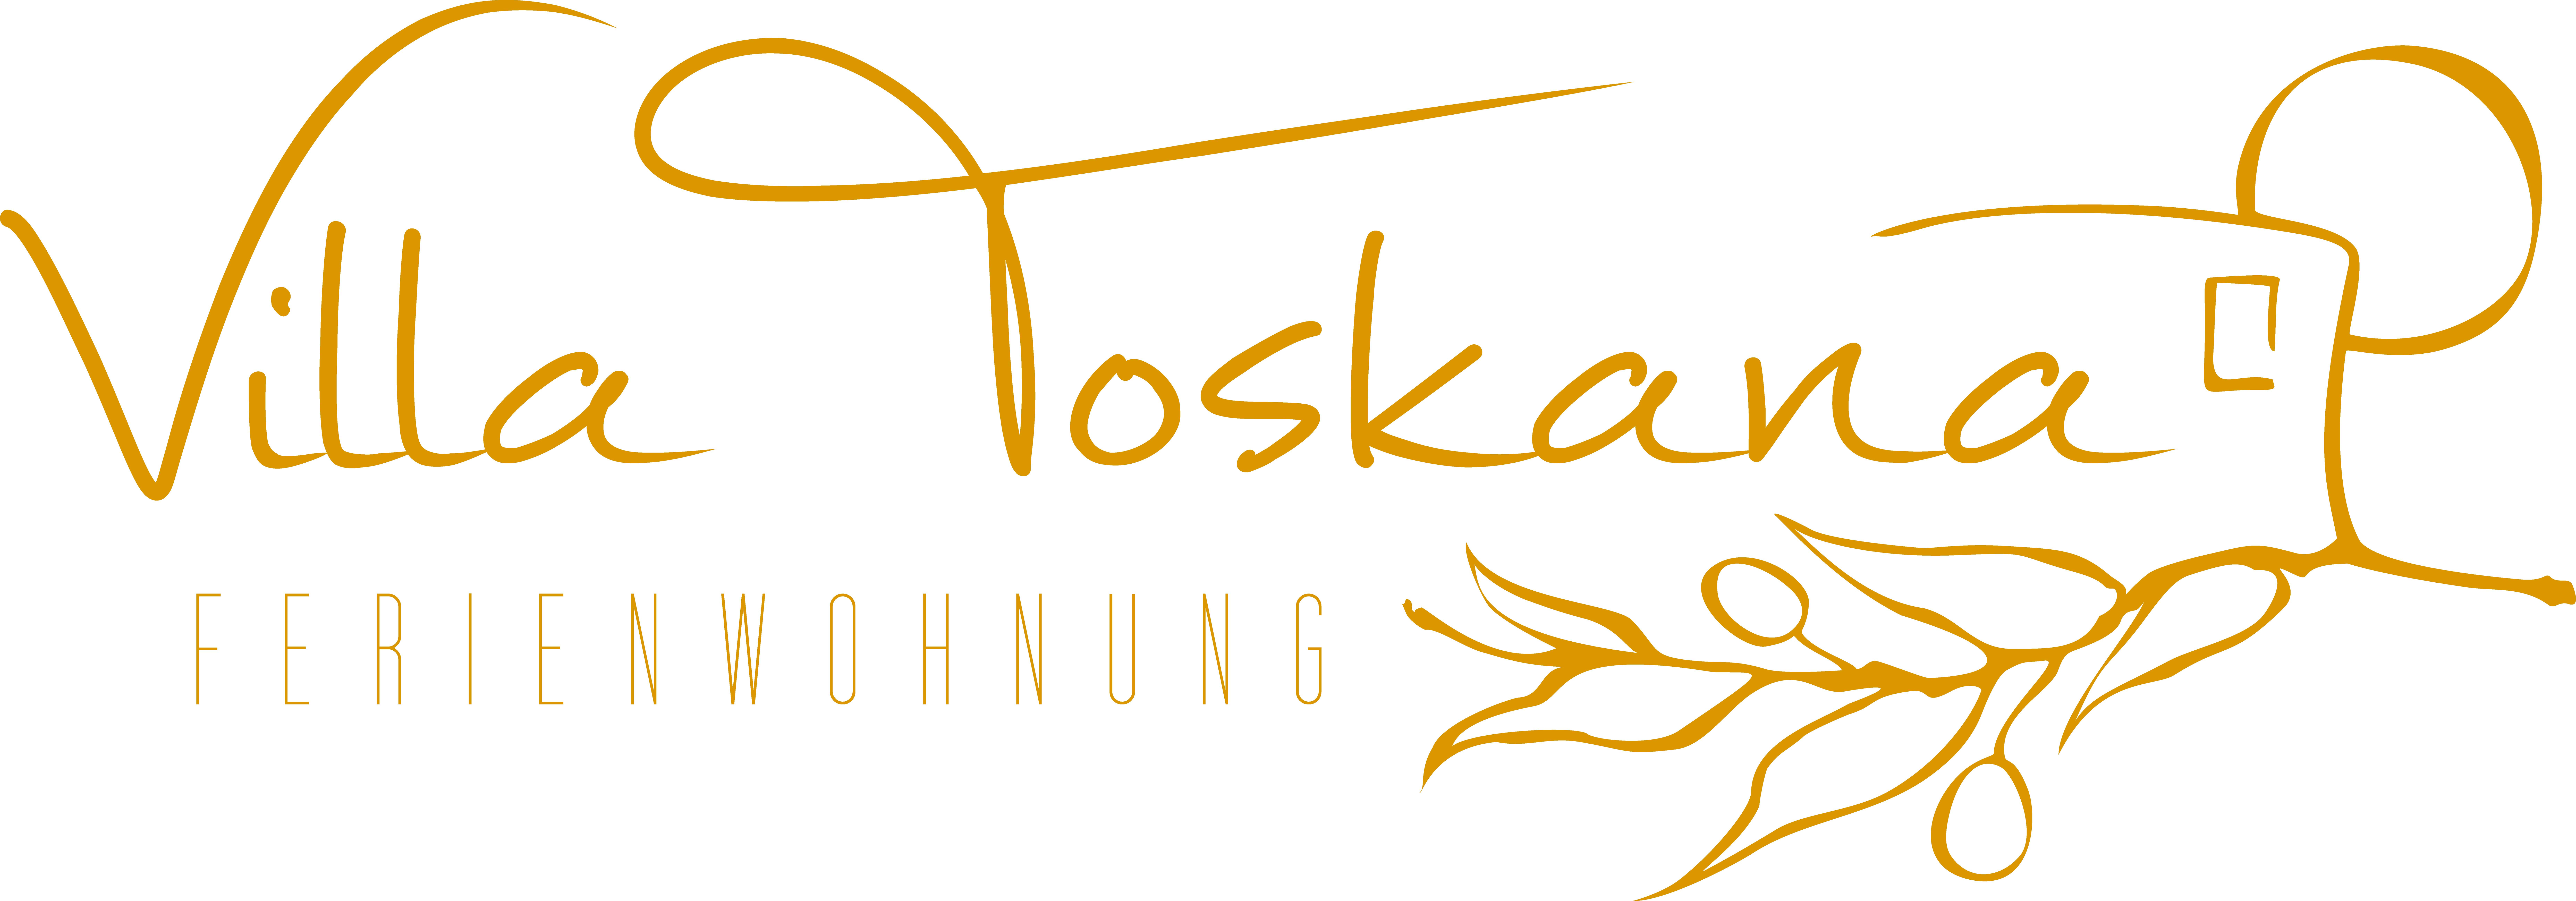 Villa Toskana - Ferienwohnung in Zirndorf